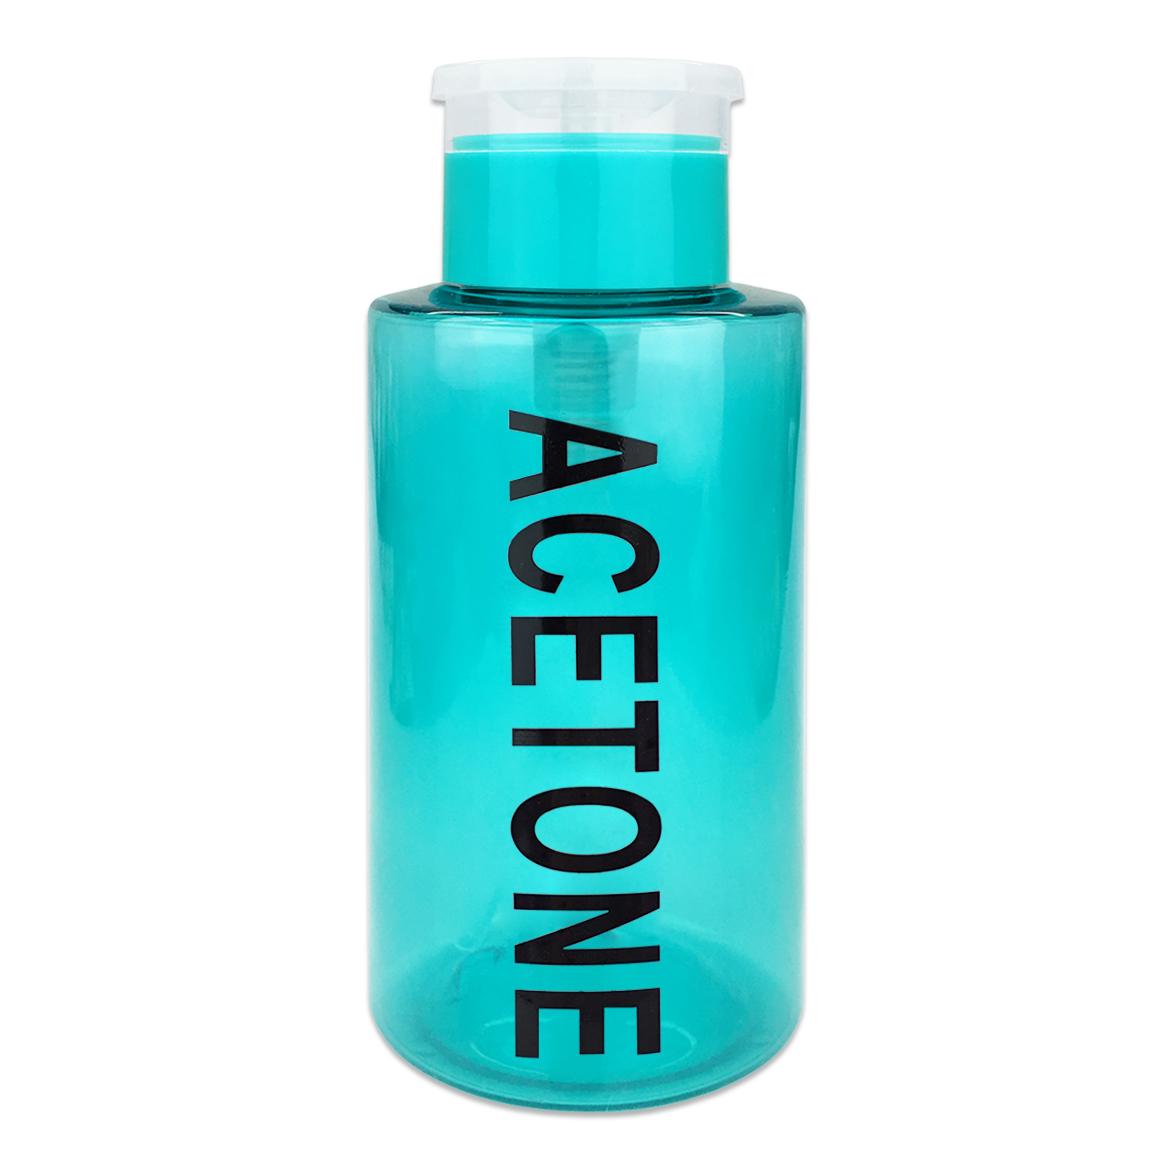 Pana High Quality 10oz Liquid Pump Dispenser With Acetone Label - Purple (1 Bottle)